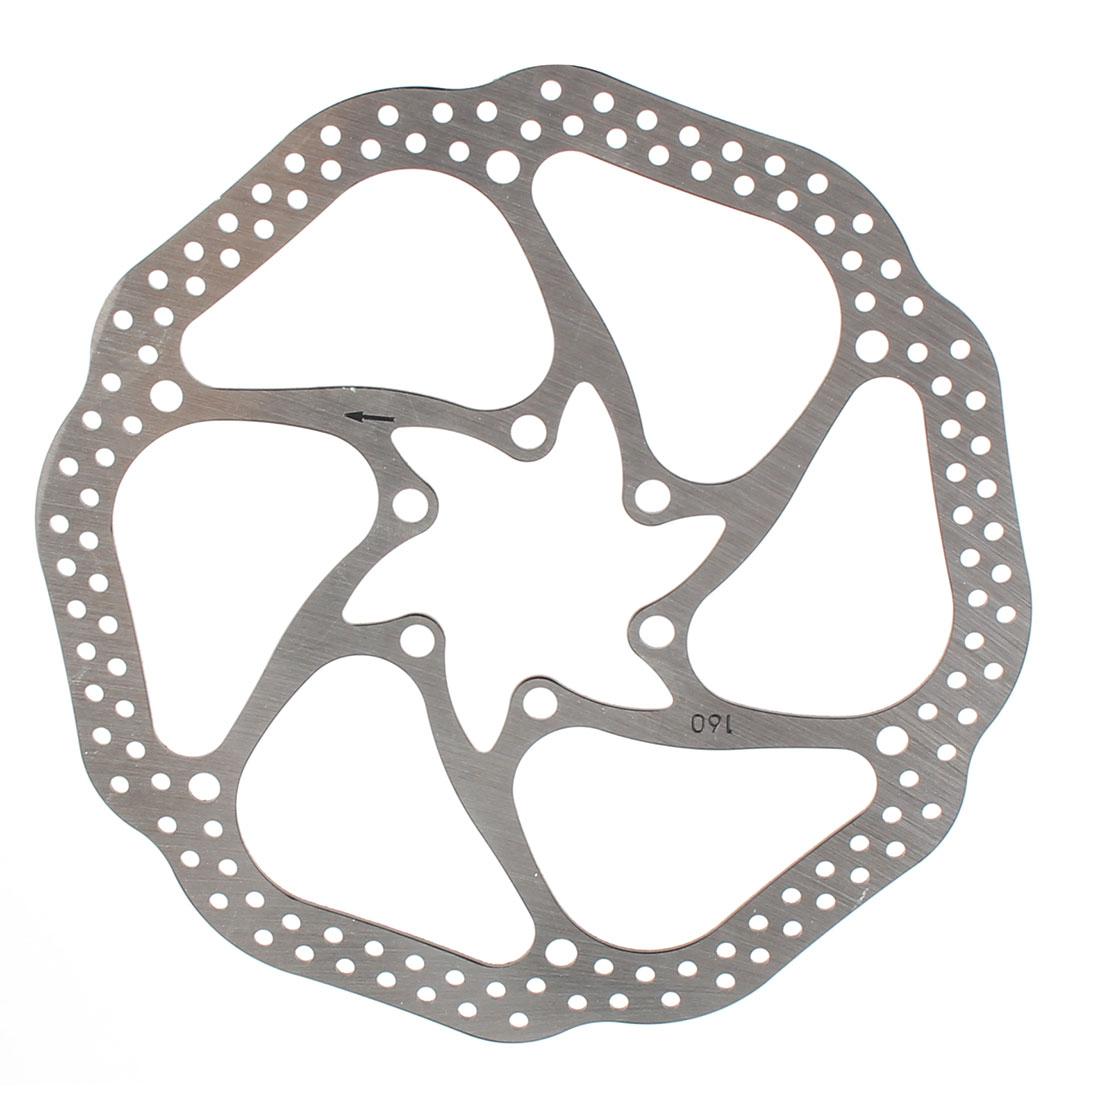 Cycling Mountain Bike Bicycle Brake Disc Metal Replacement Plate 160mm Diameter